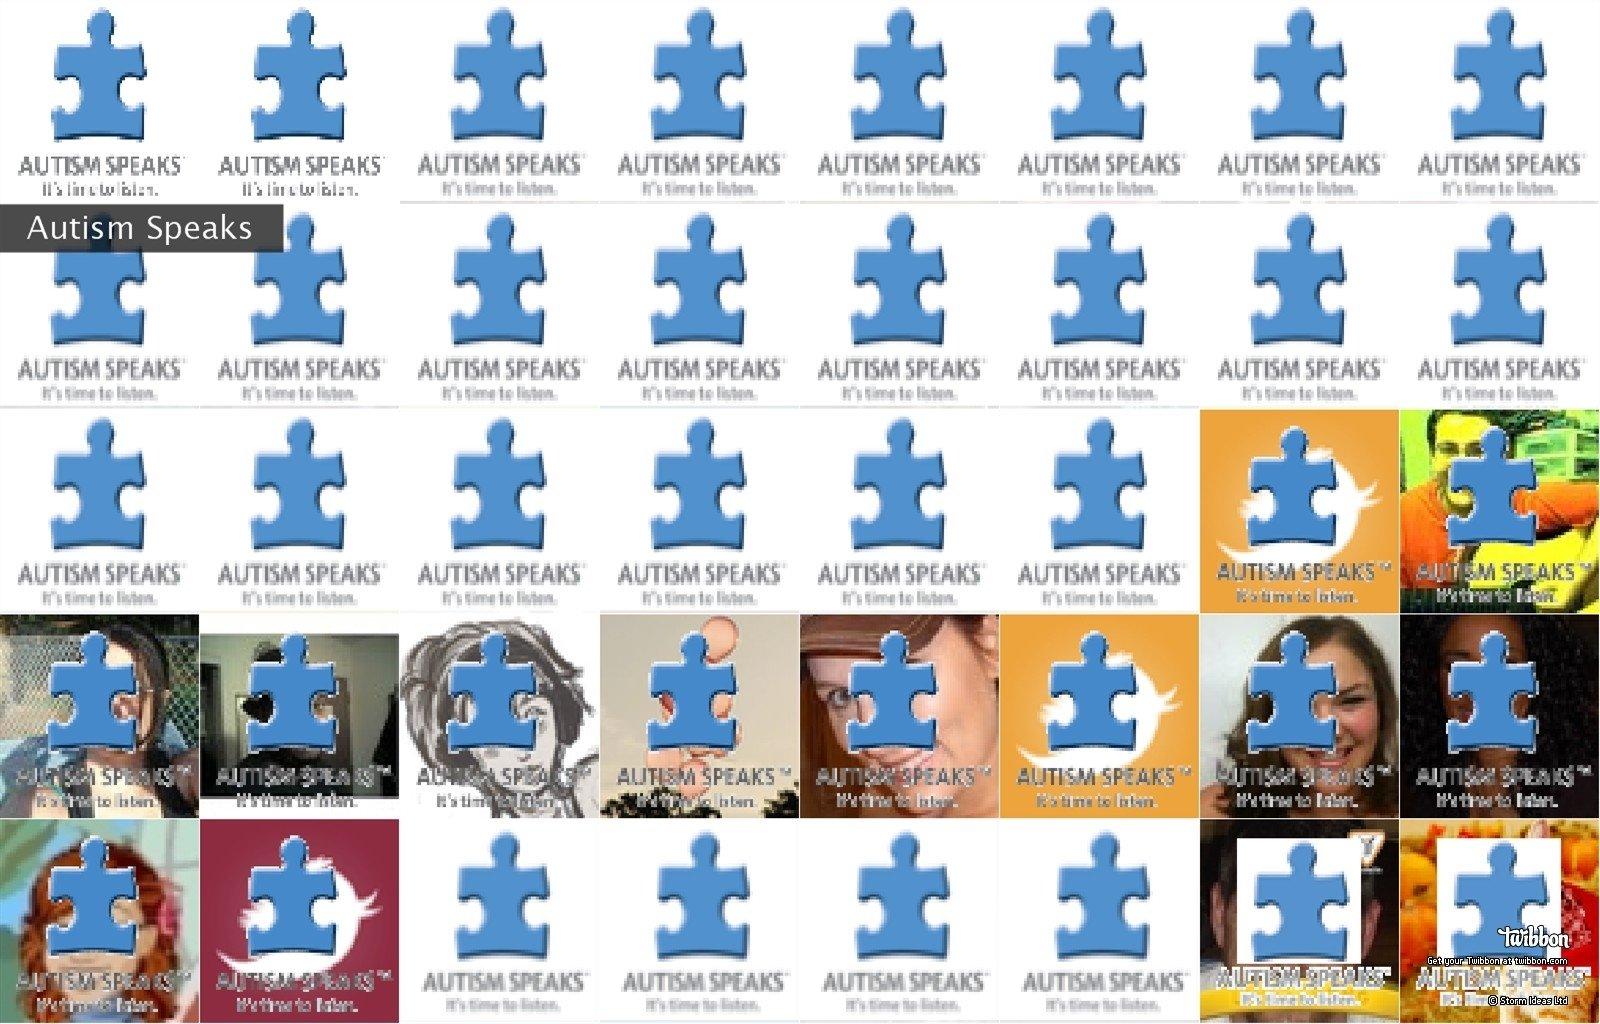 10 Perfect Light It Up Blue Ideas light it up blue frame resources autism speaks twibute 50 2020